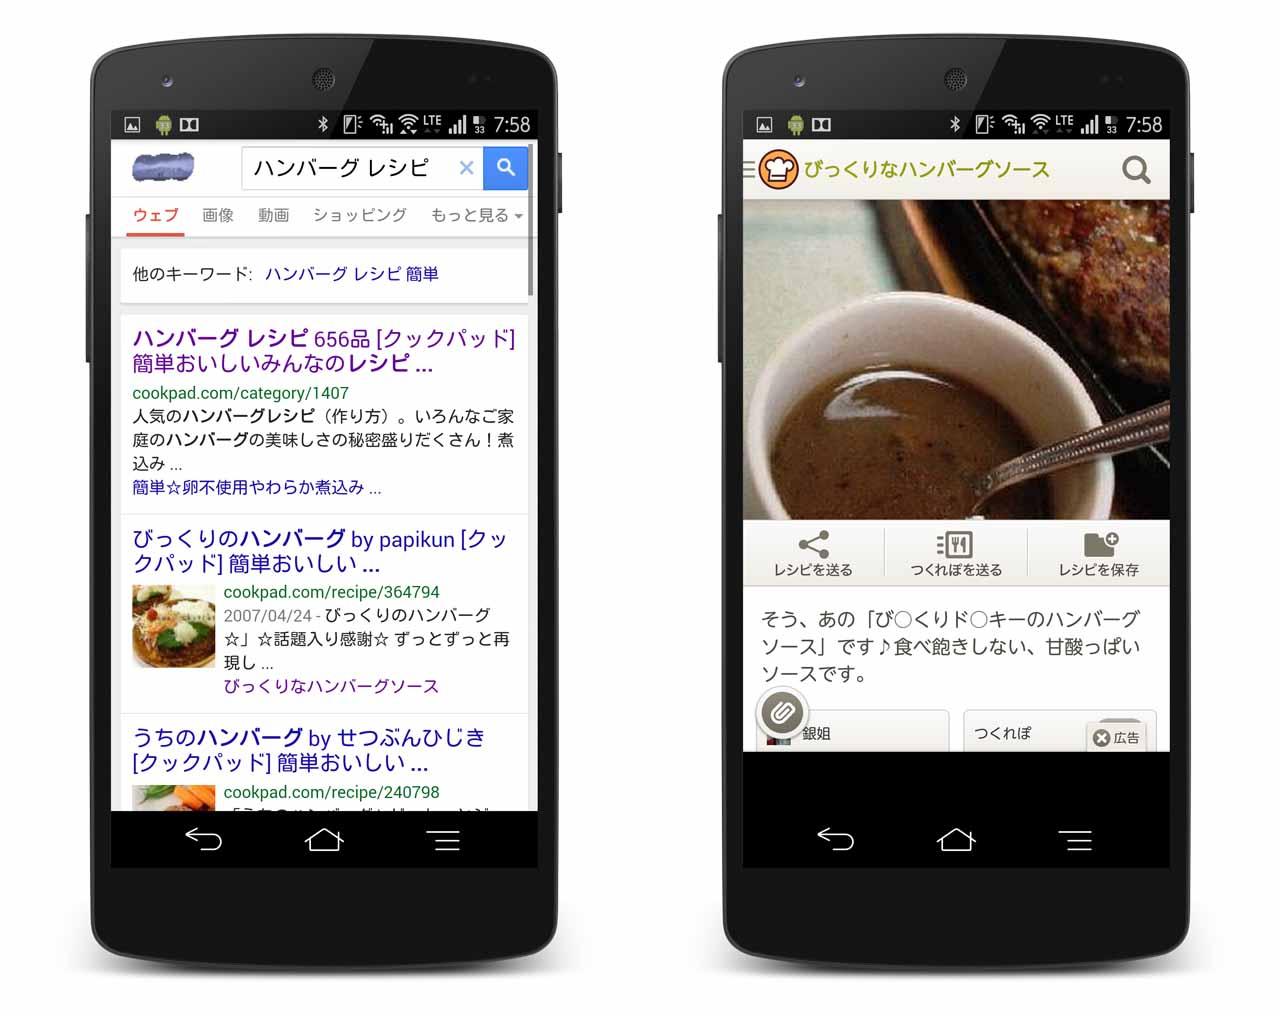 Googleの検索結果から直接アプリを起動できる「アプリインデックス」を試す